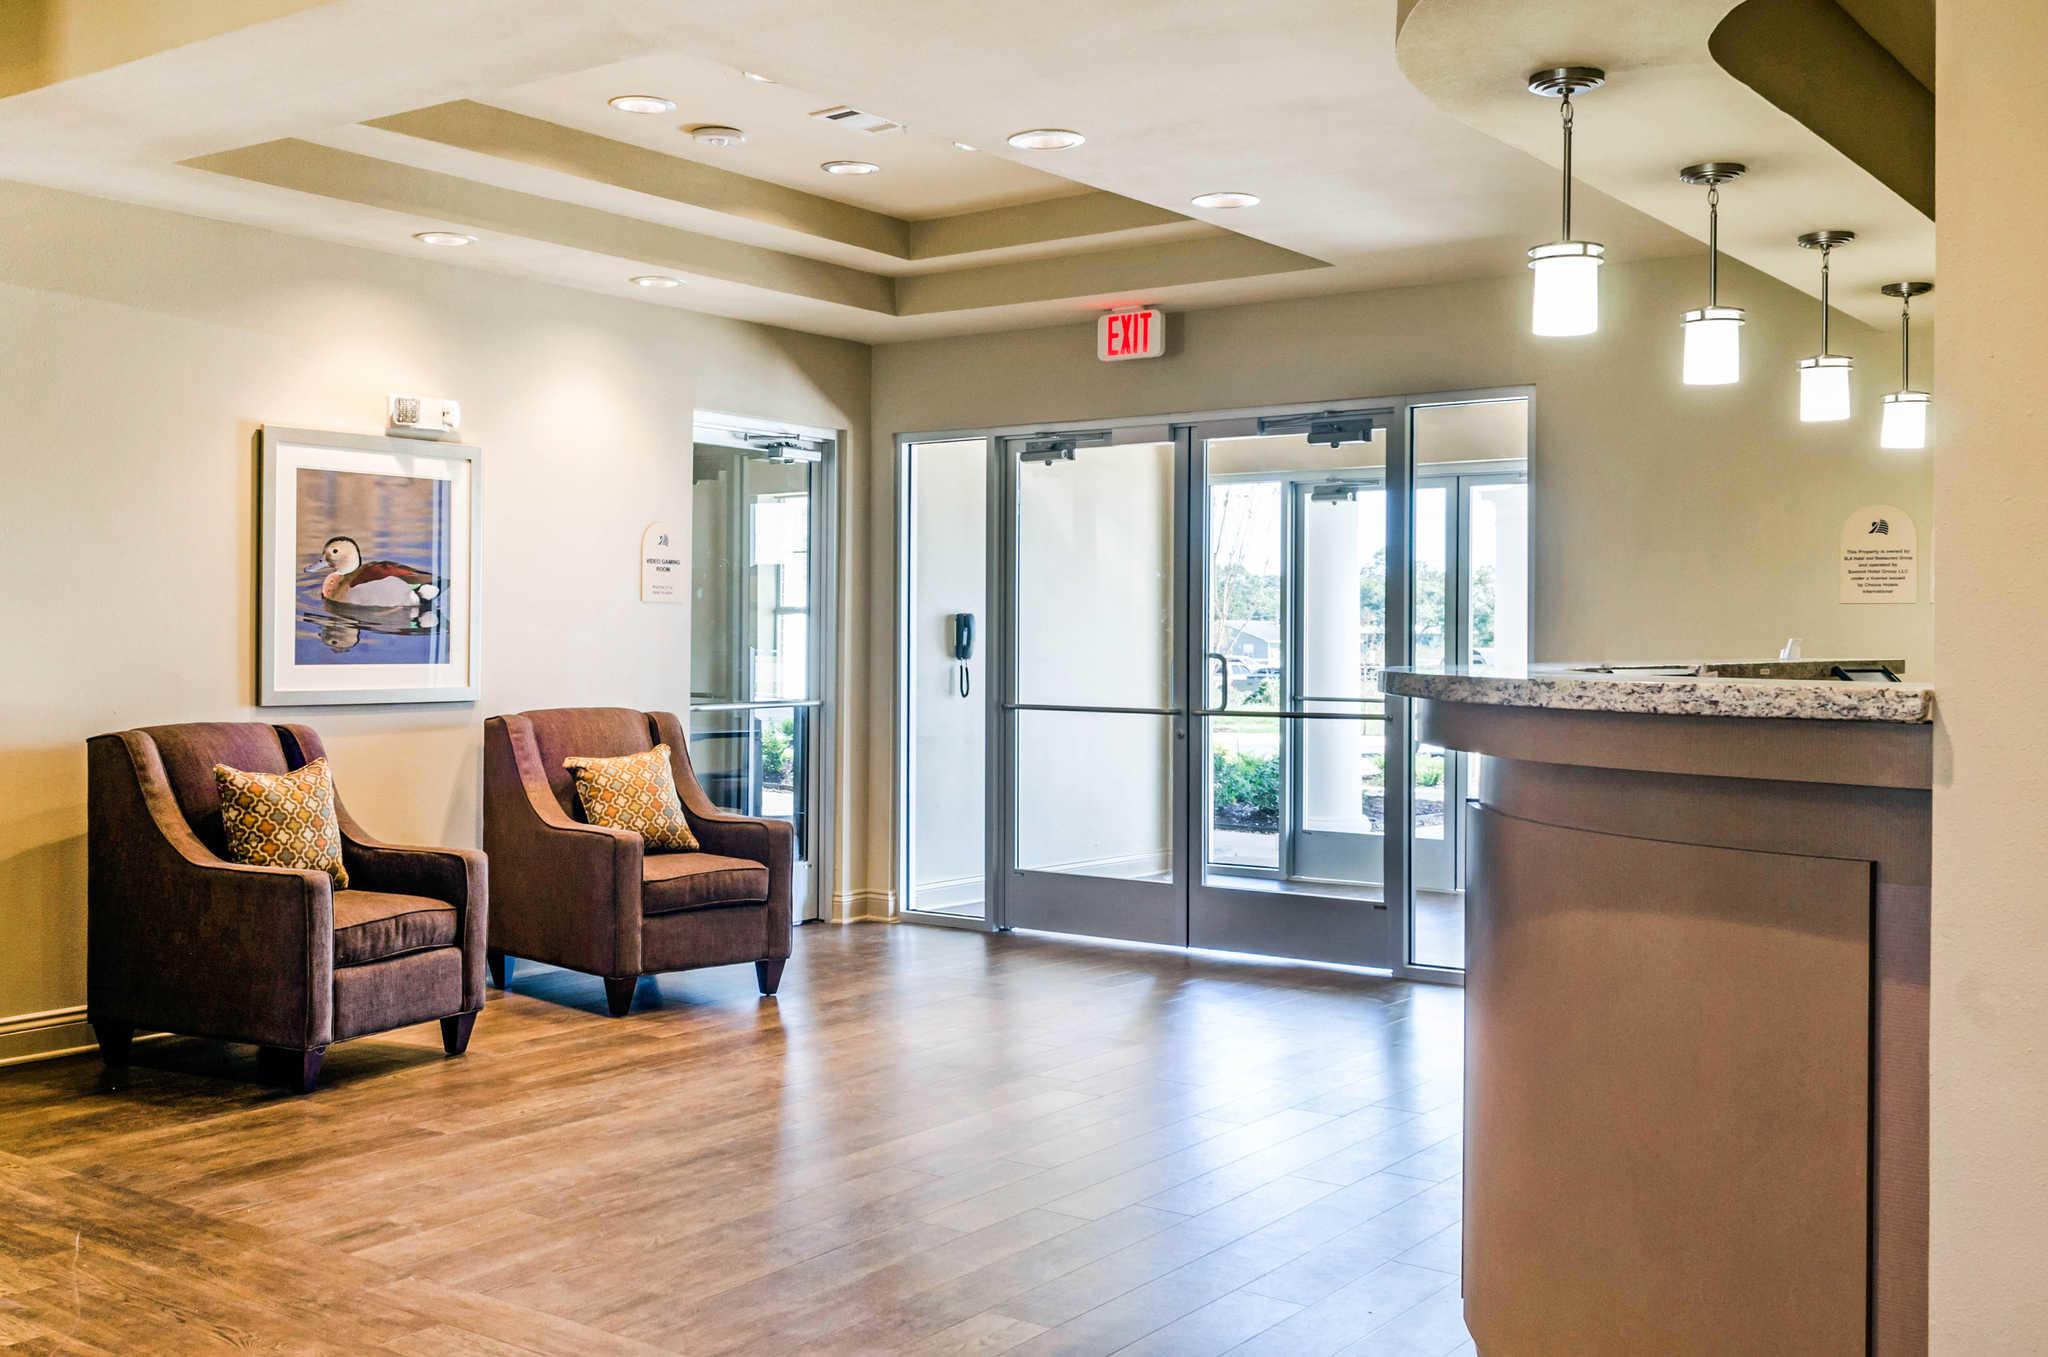 MainStay Suites Hackberry Sportsman's Lodge image 7